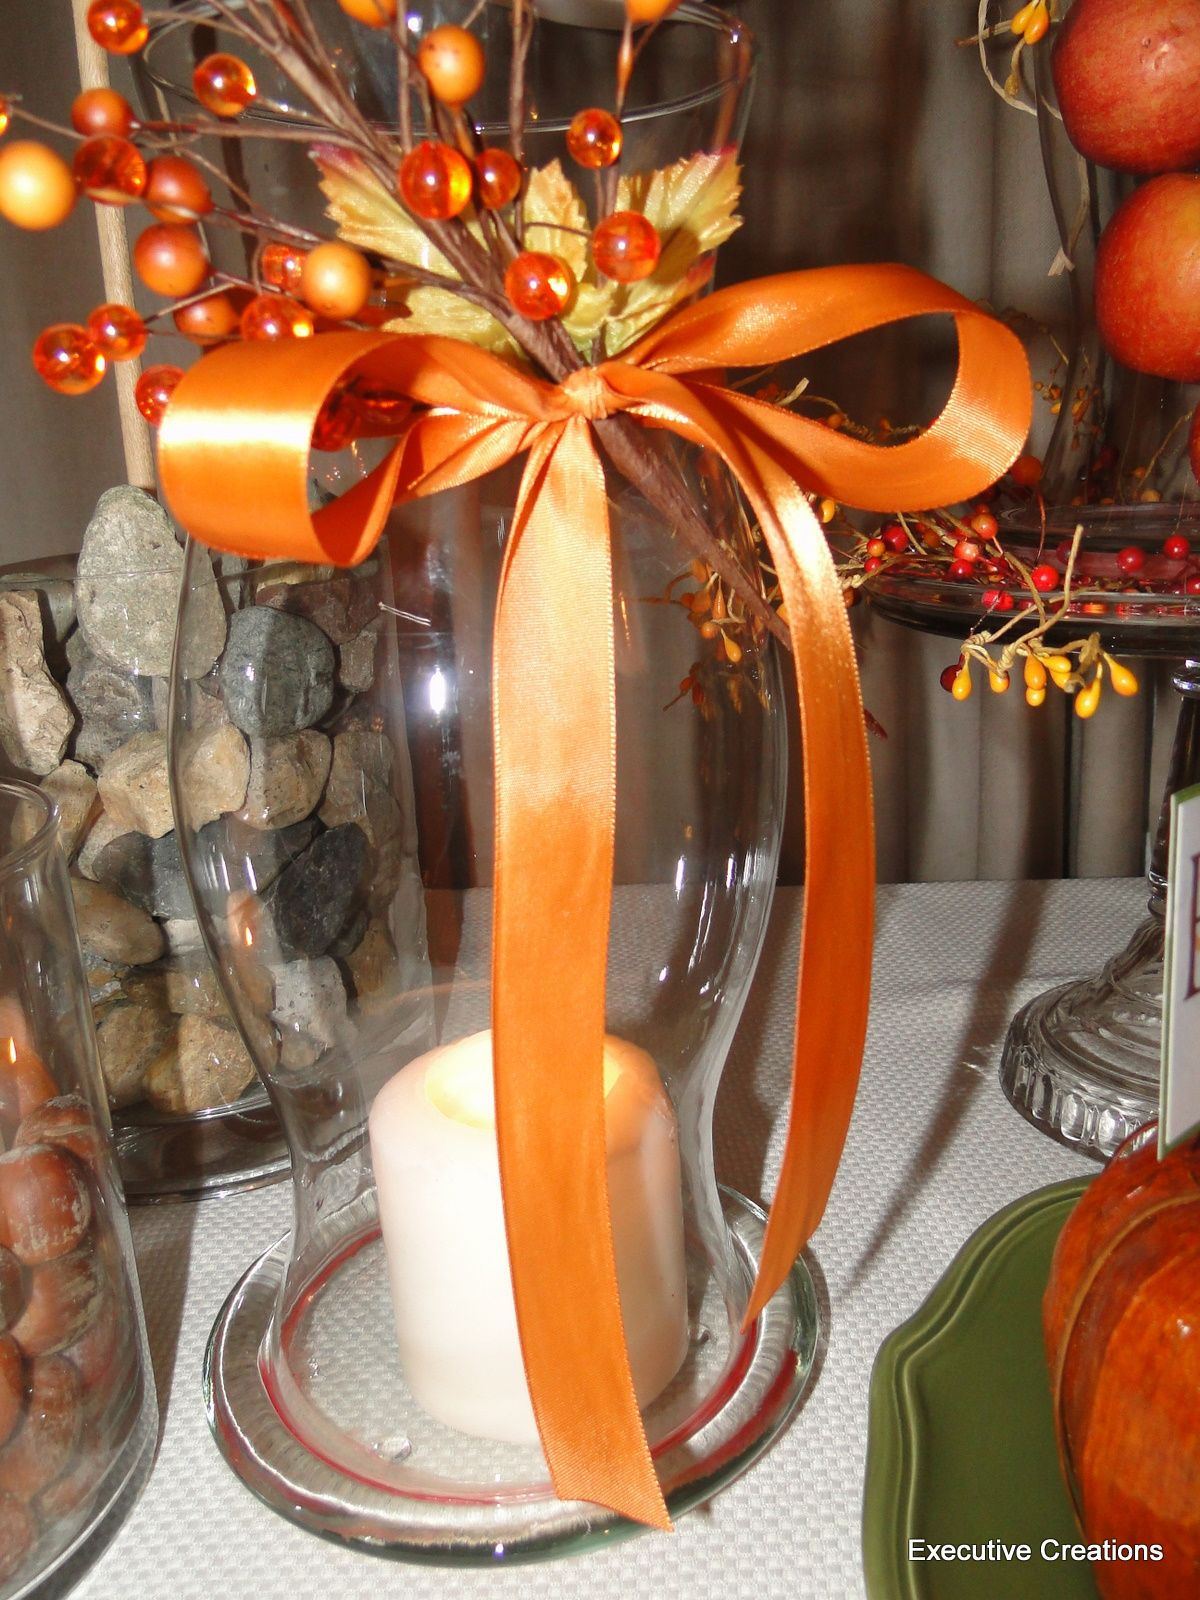 Diy Fall Hurricane Vase Dress Up Hurricane Lamps And